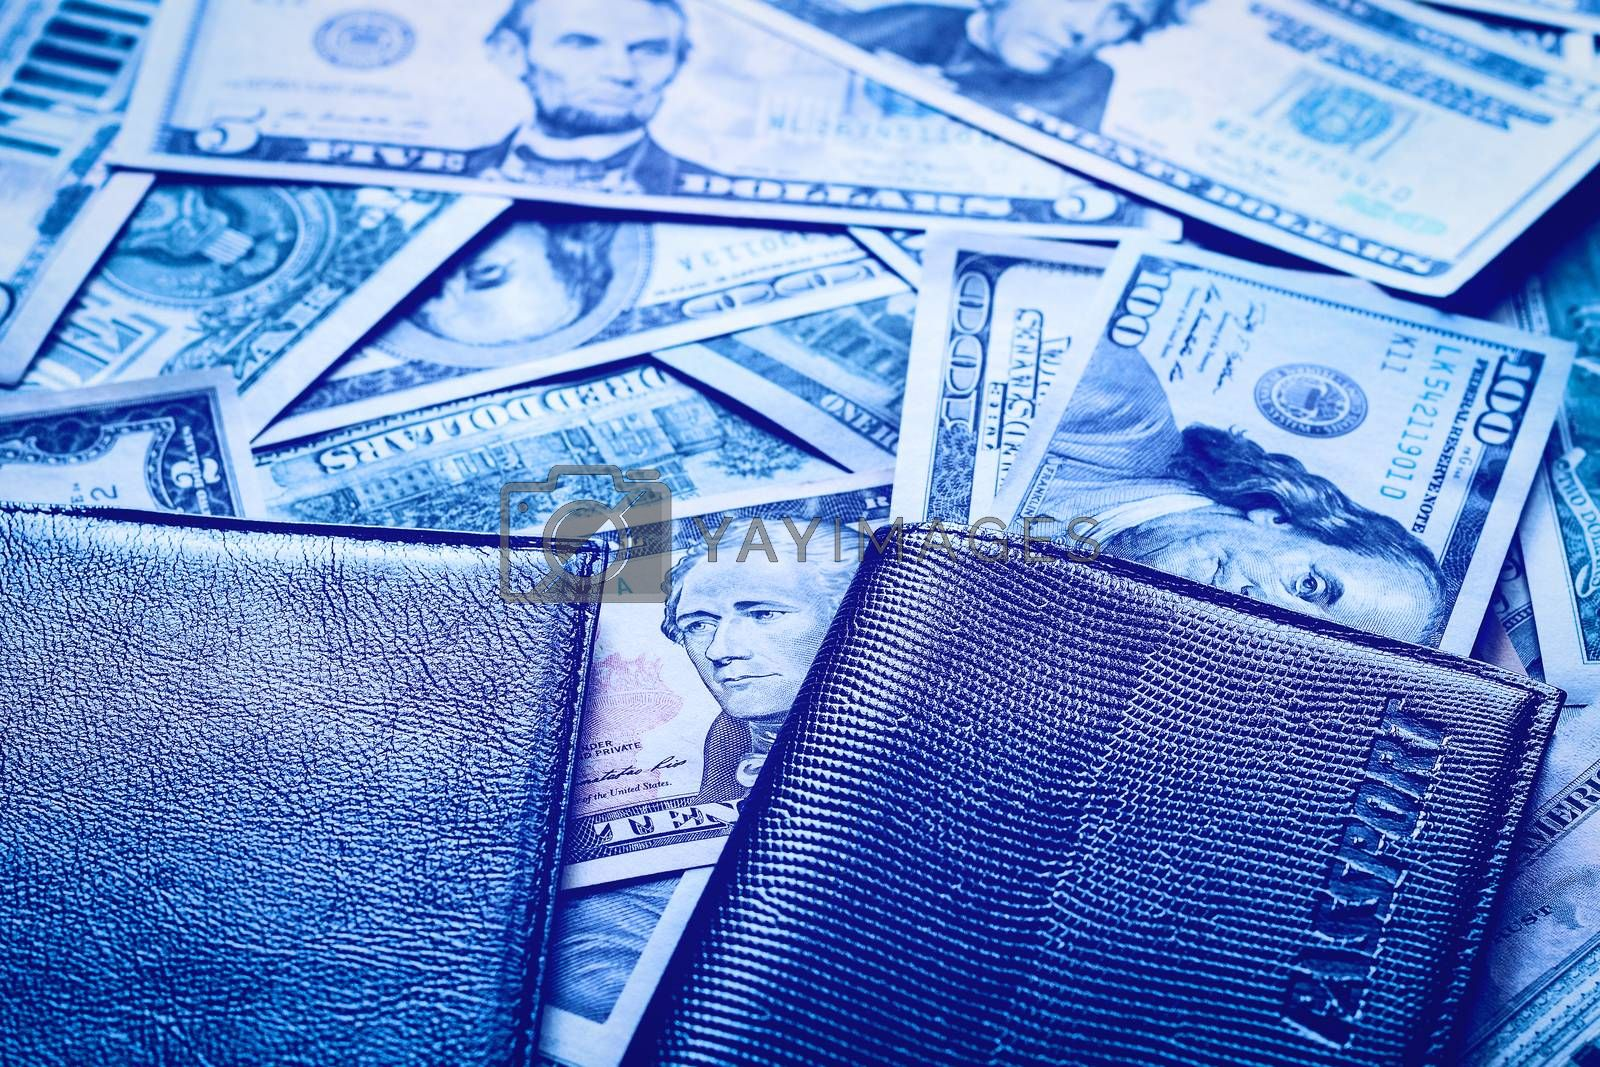 American dollar bills and passport. by Eugene Yemelyanov